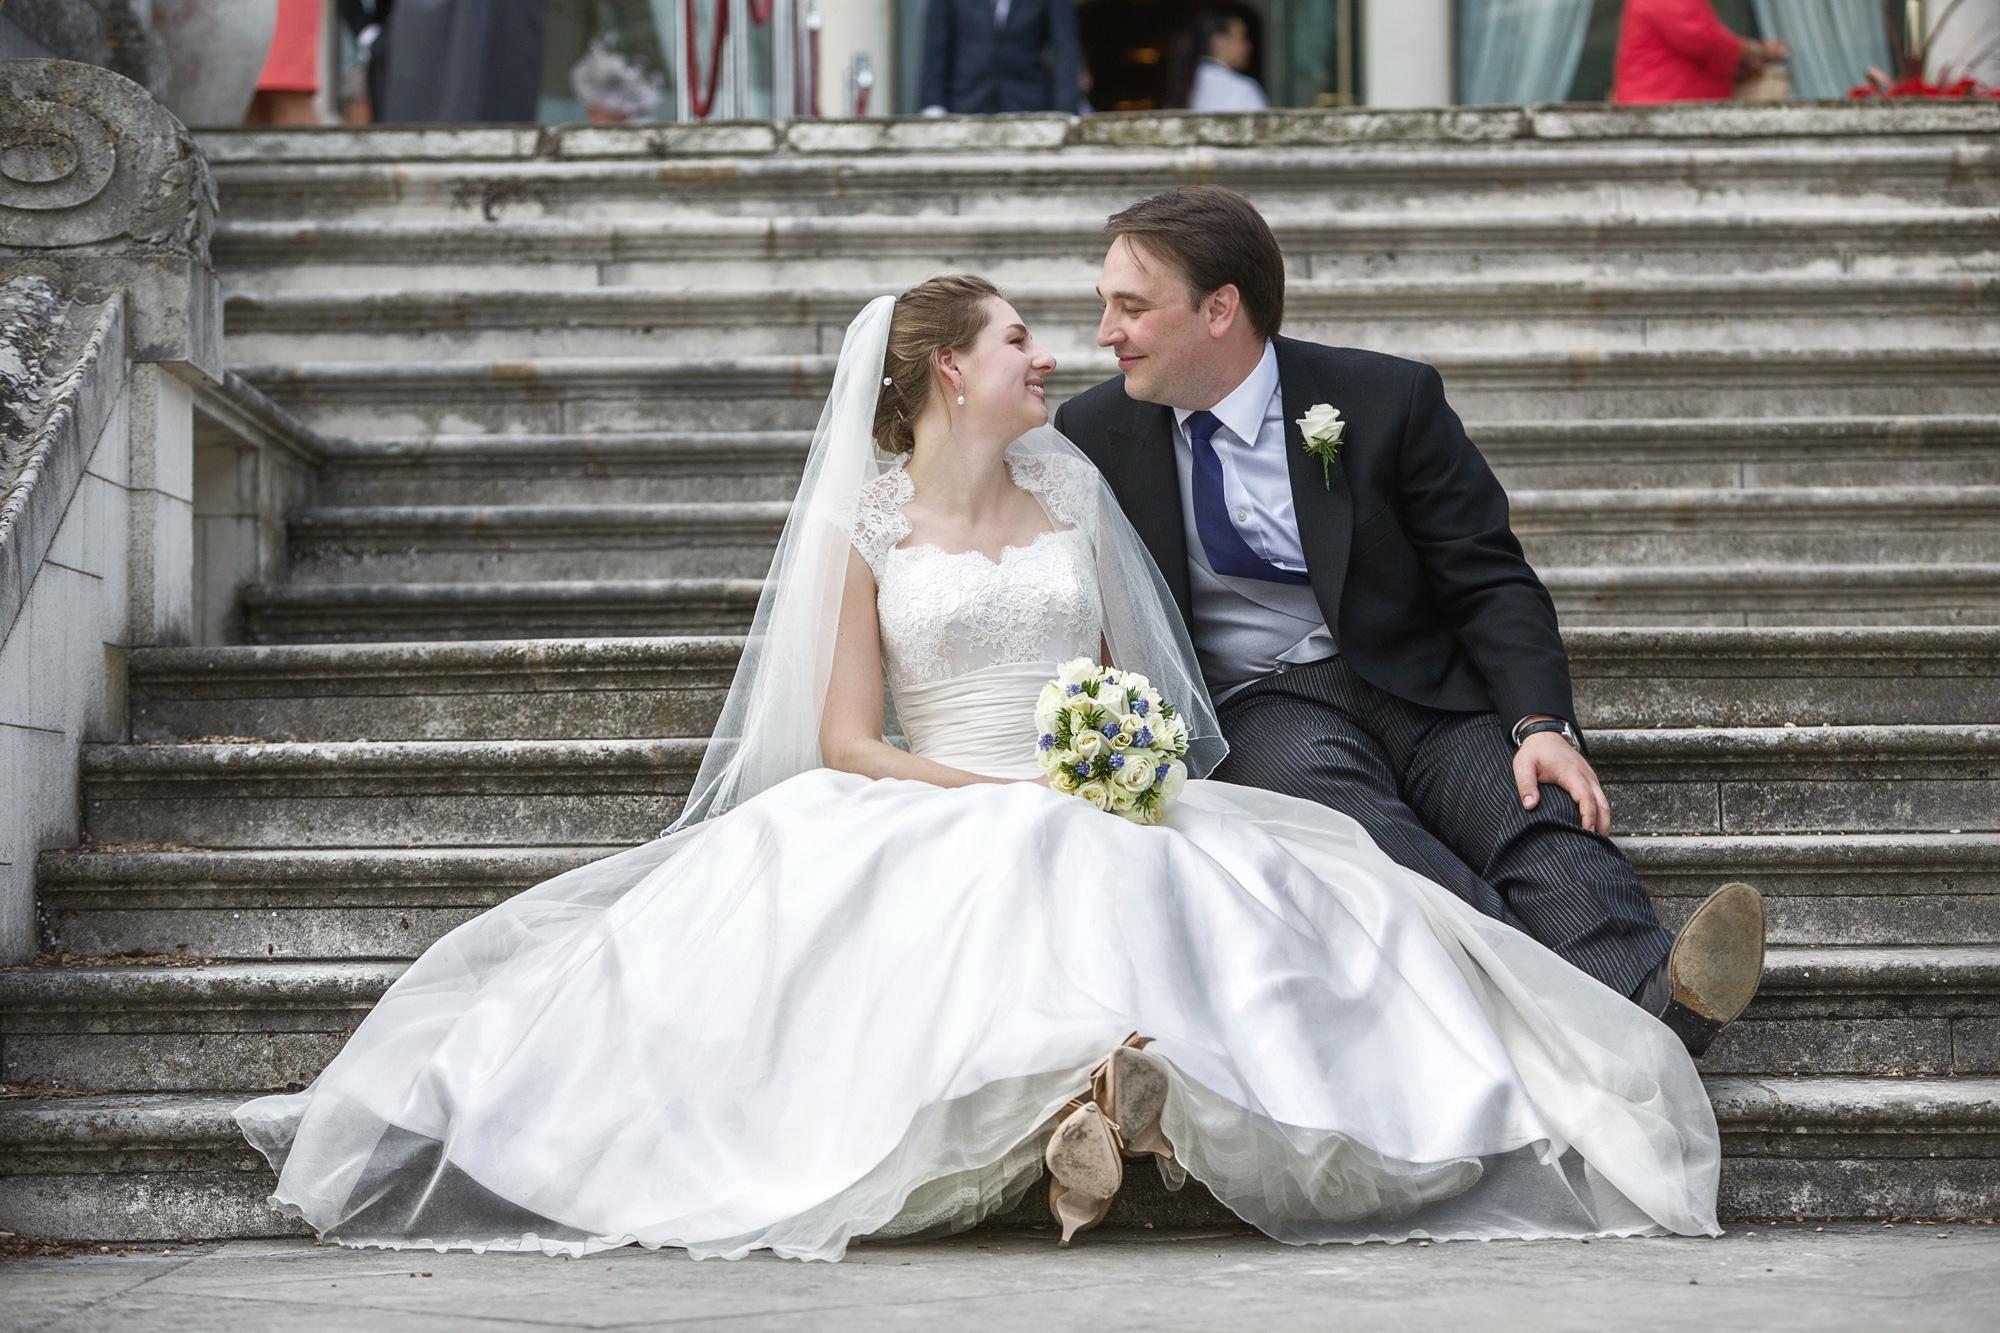 Adam_Hillier_Wedding_Photographer_Newbury_Berkshire_0.jpg